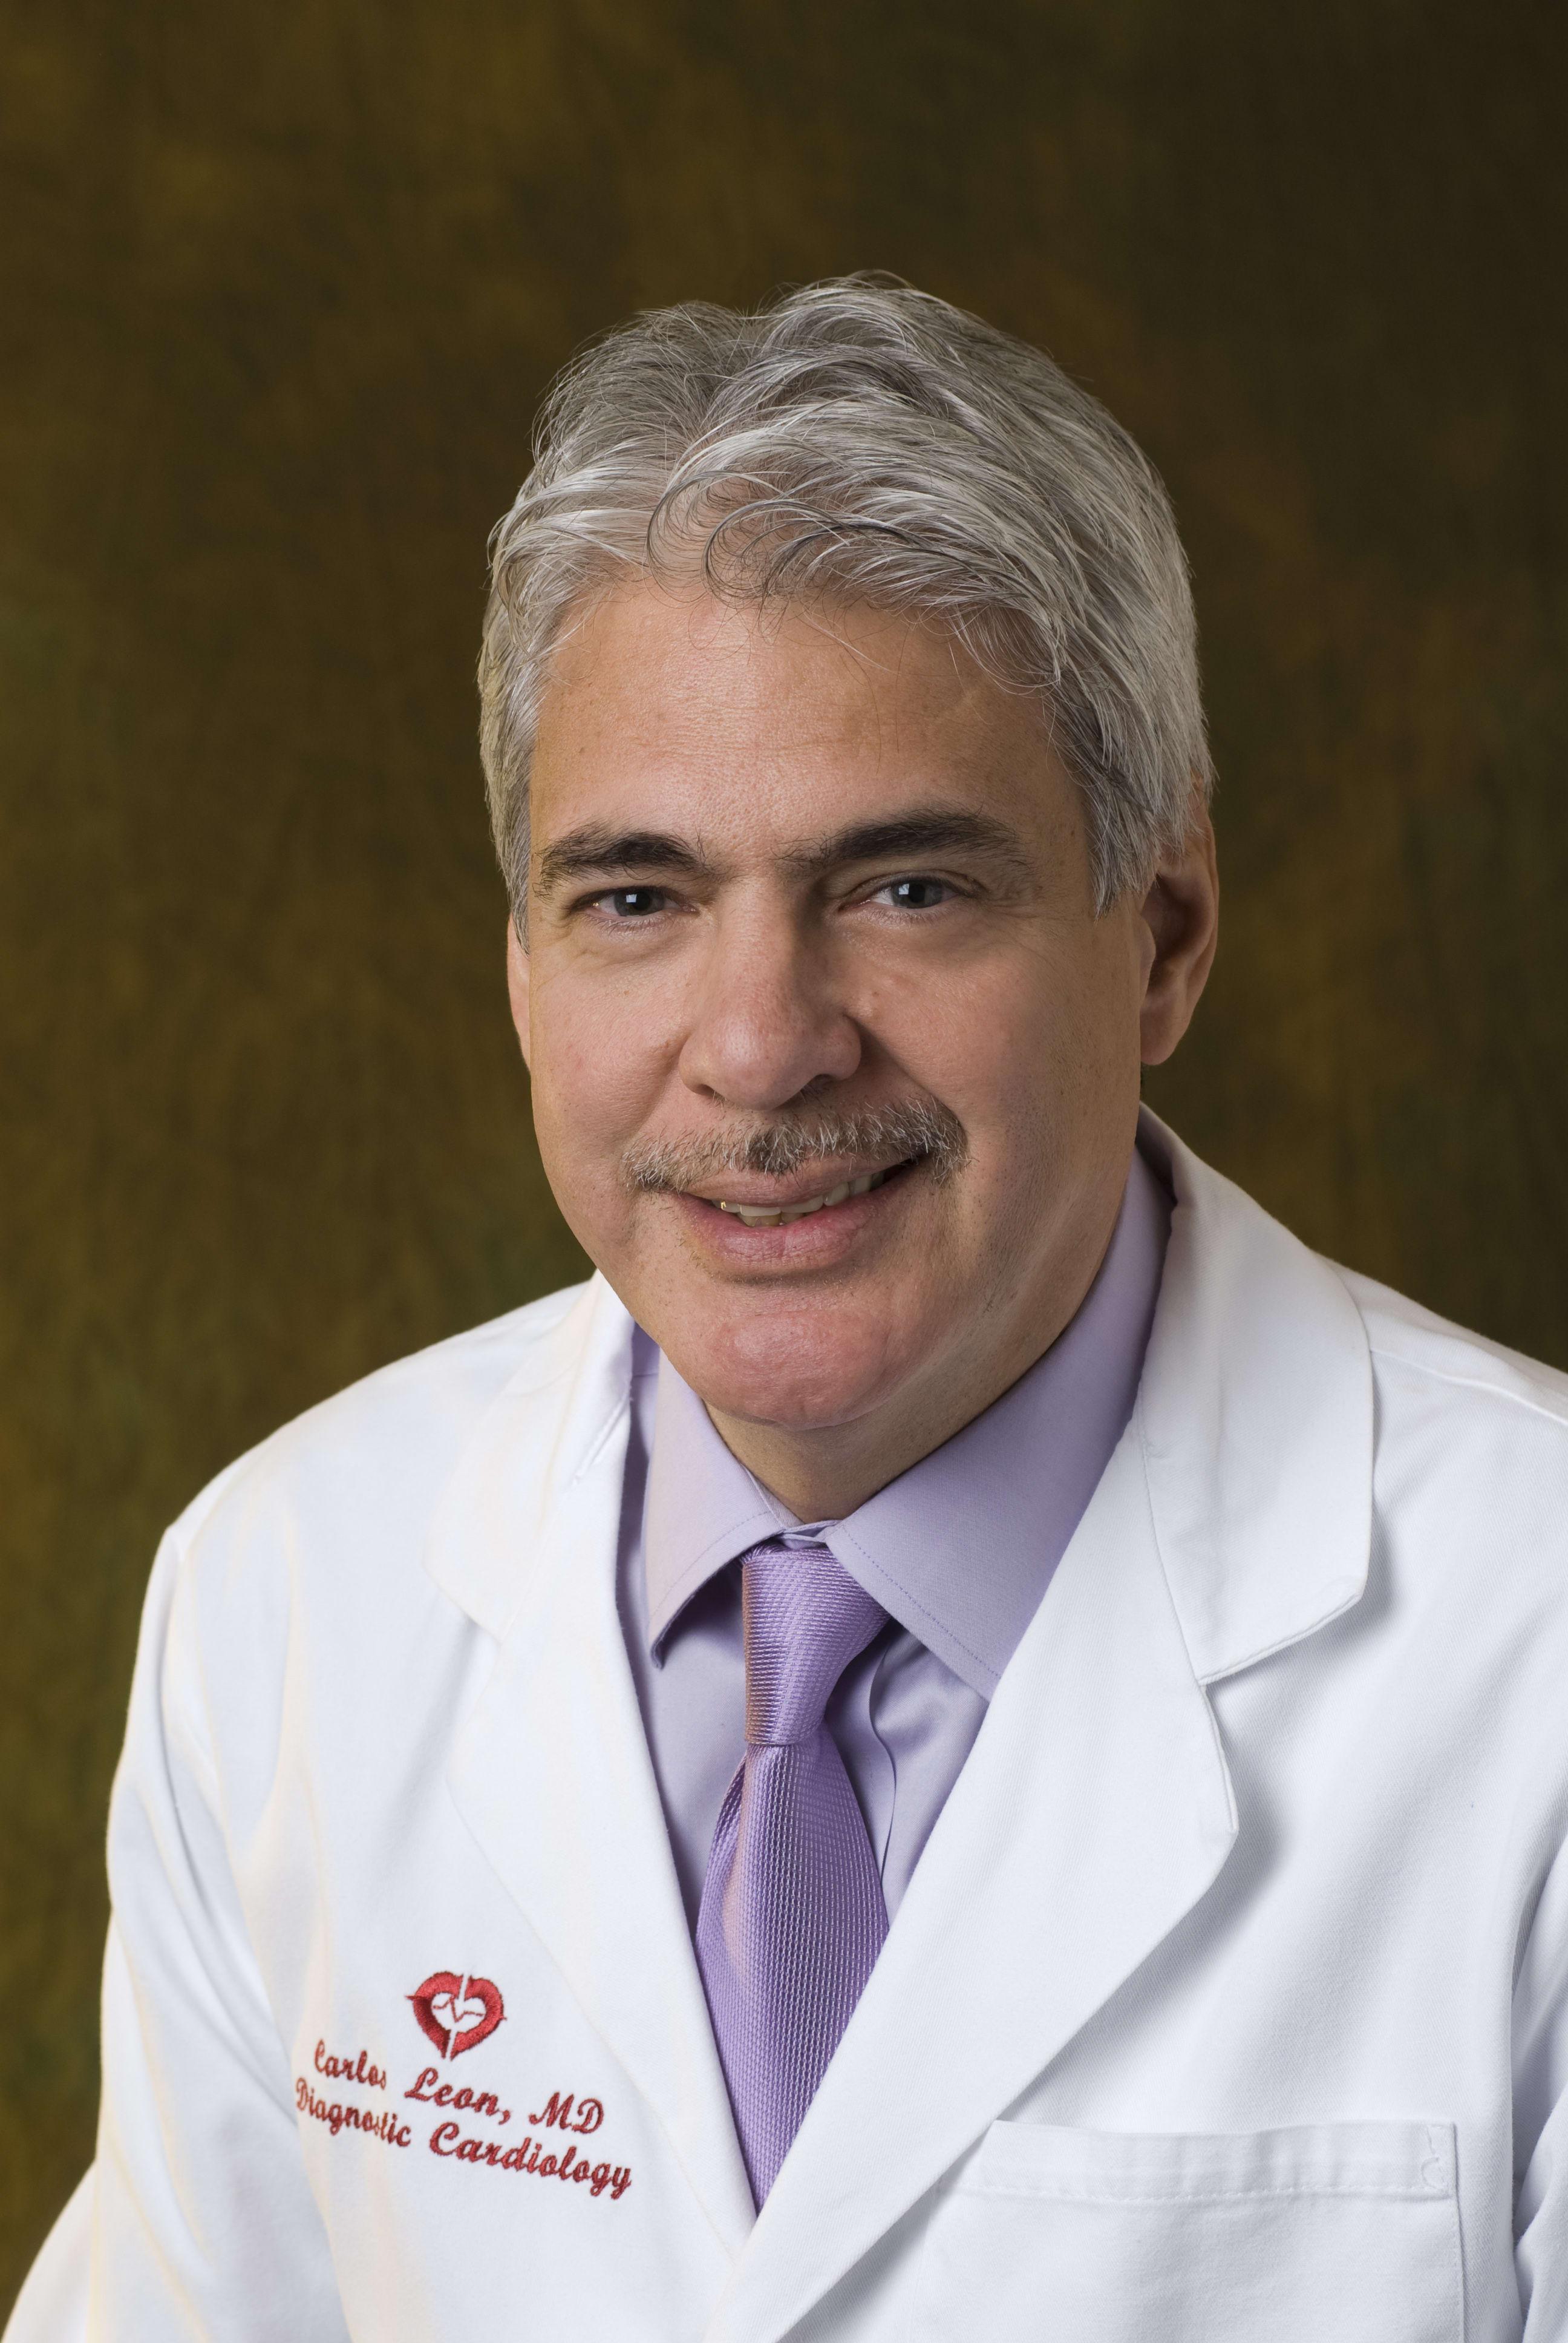 Dr carlos leon jacksonville fl